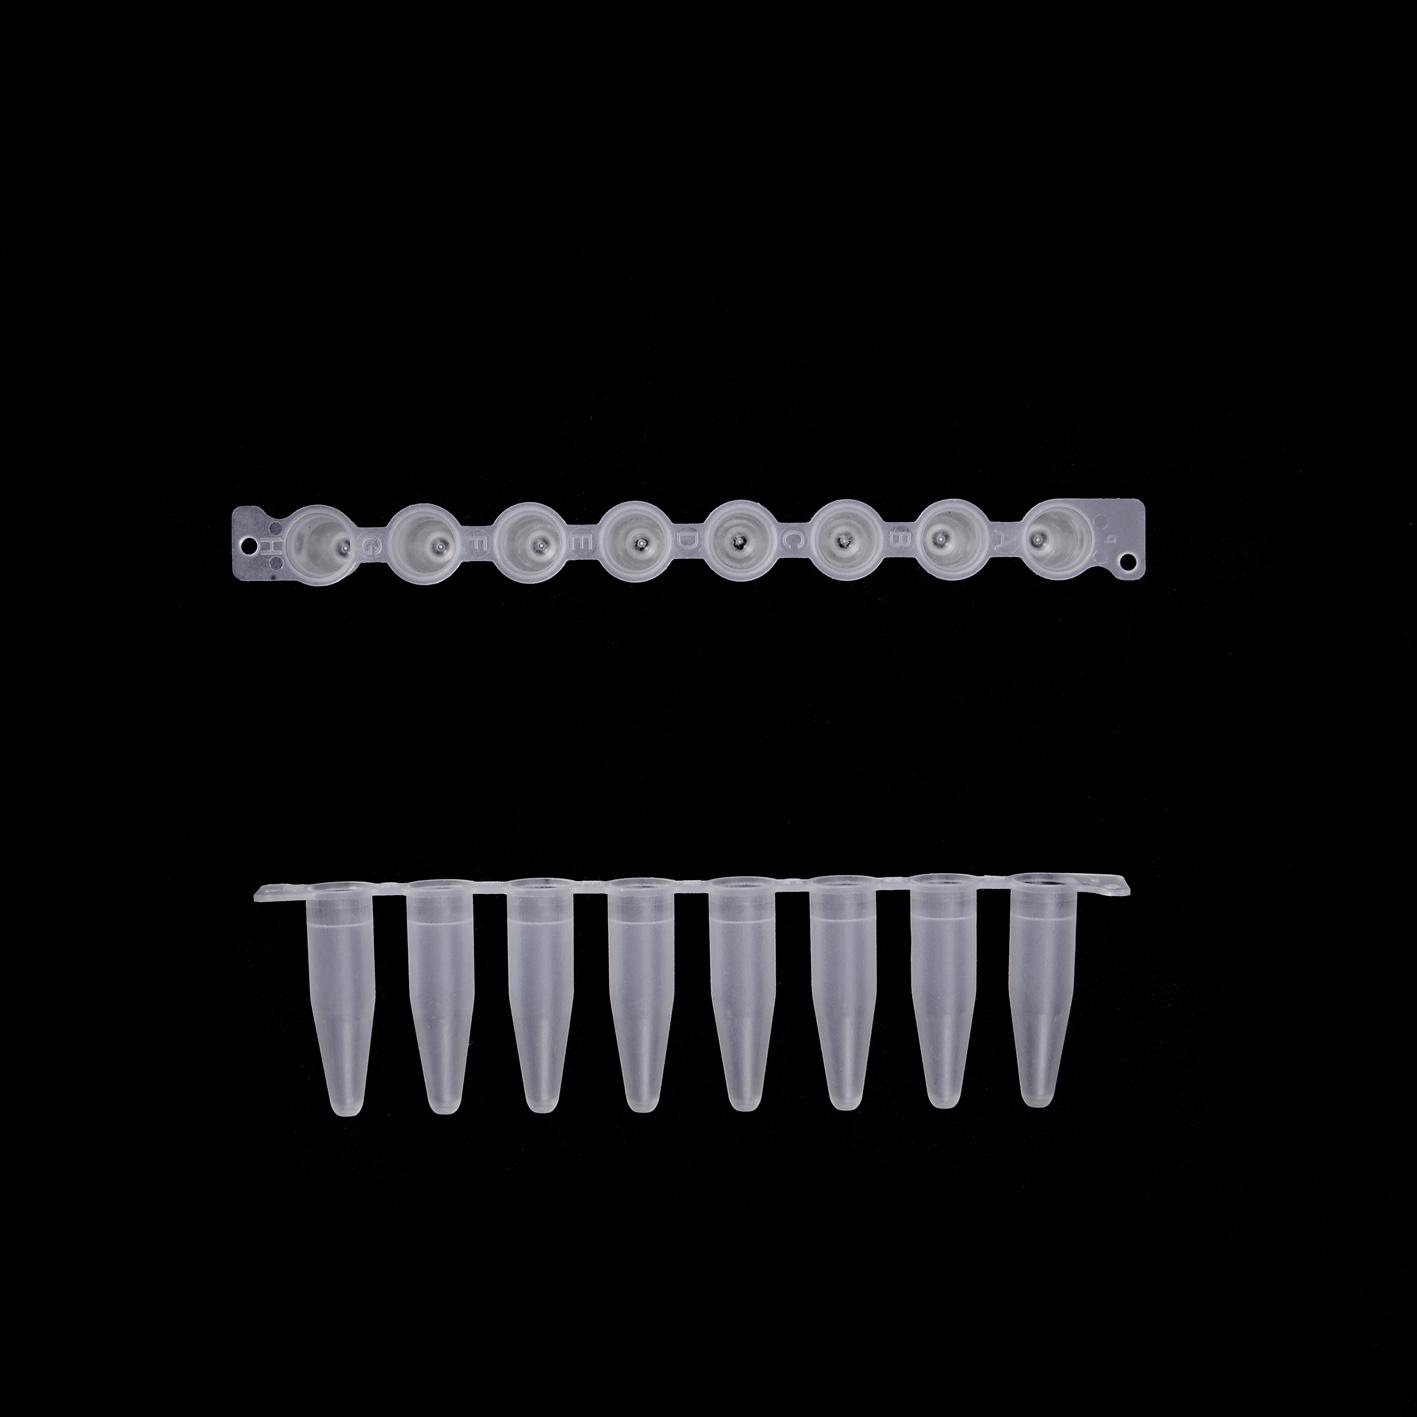 EU 0.2 ml 薄壁八联管(磨砂,普通连接)